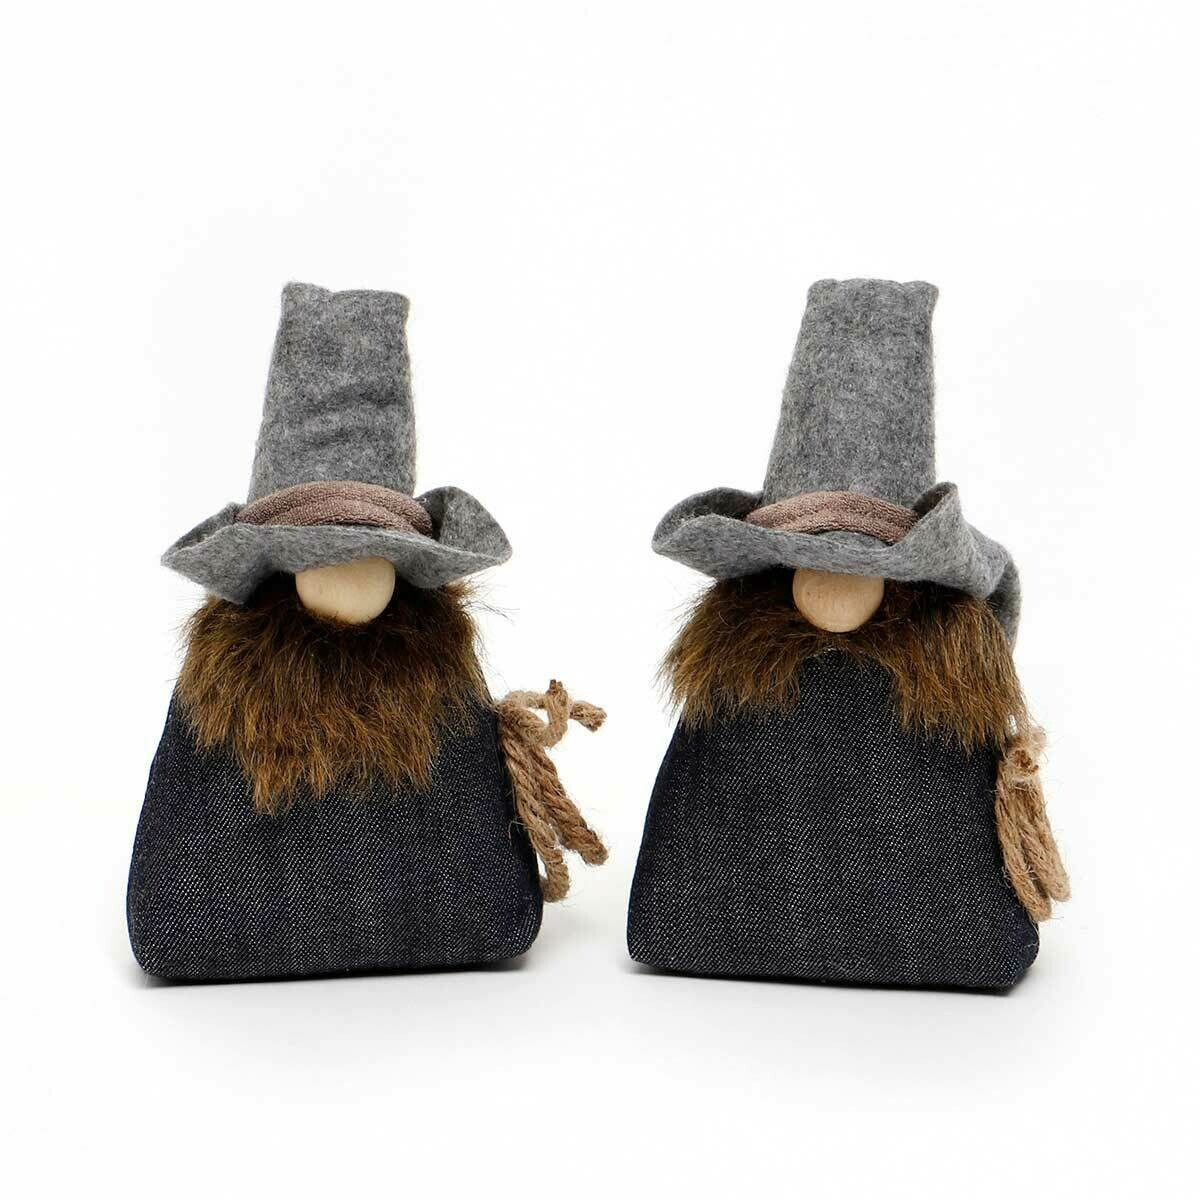 Ryder & Rex Denim Gnomes, Sold Separately